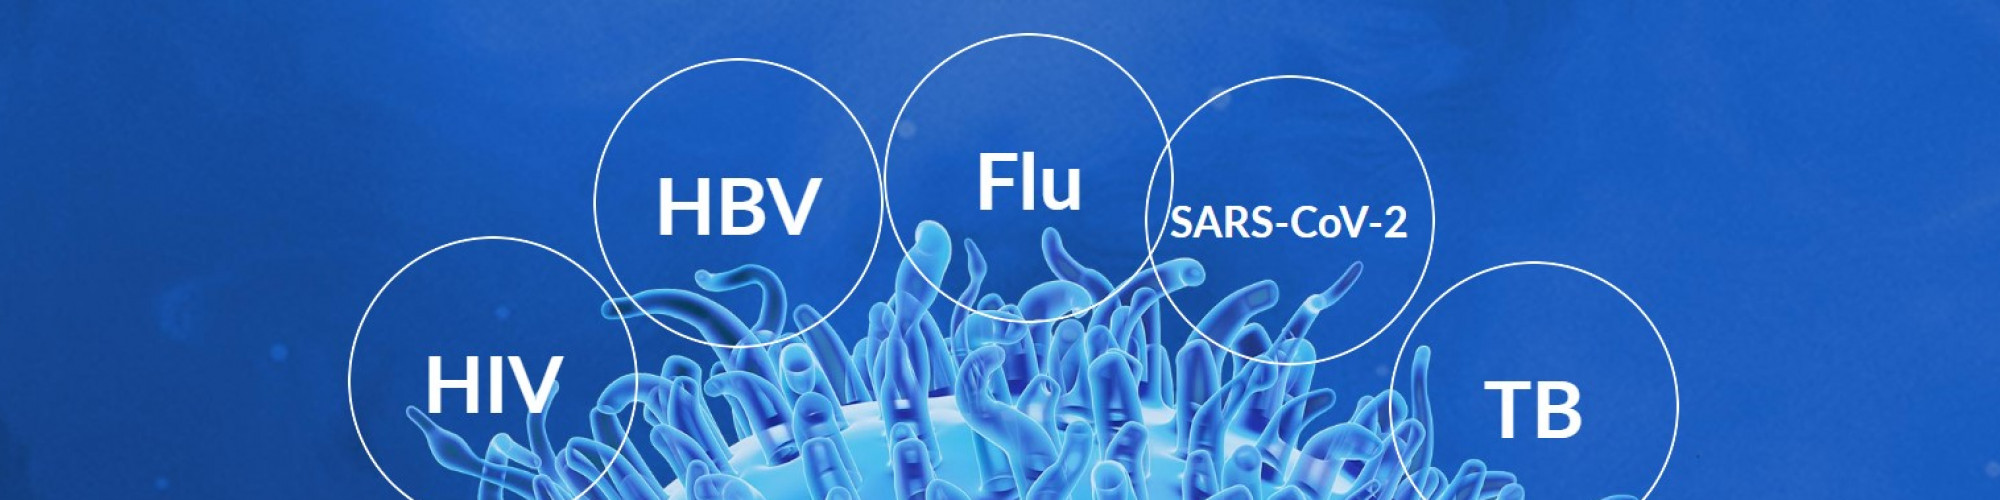 Vir Biotechnology, Inc